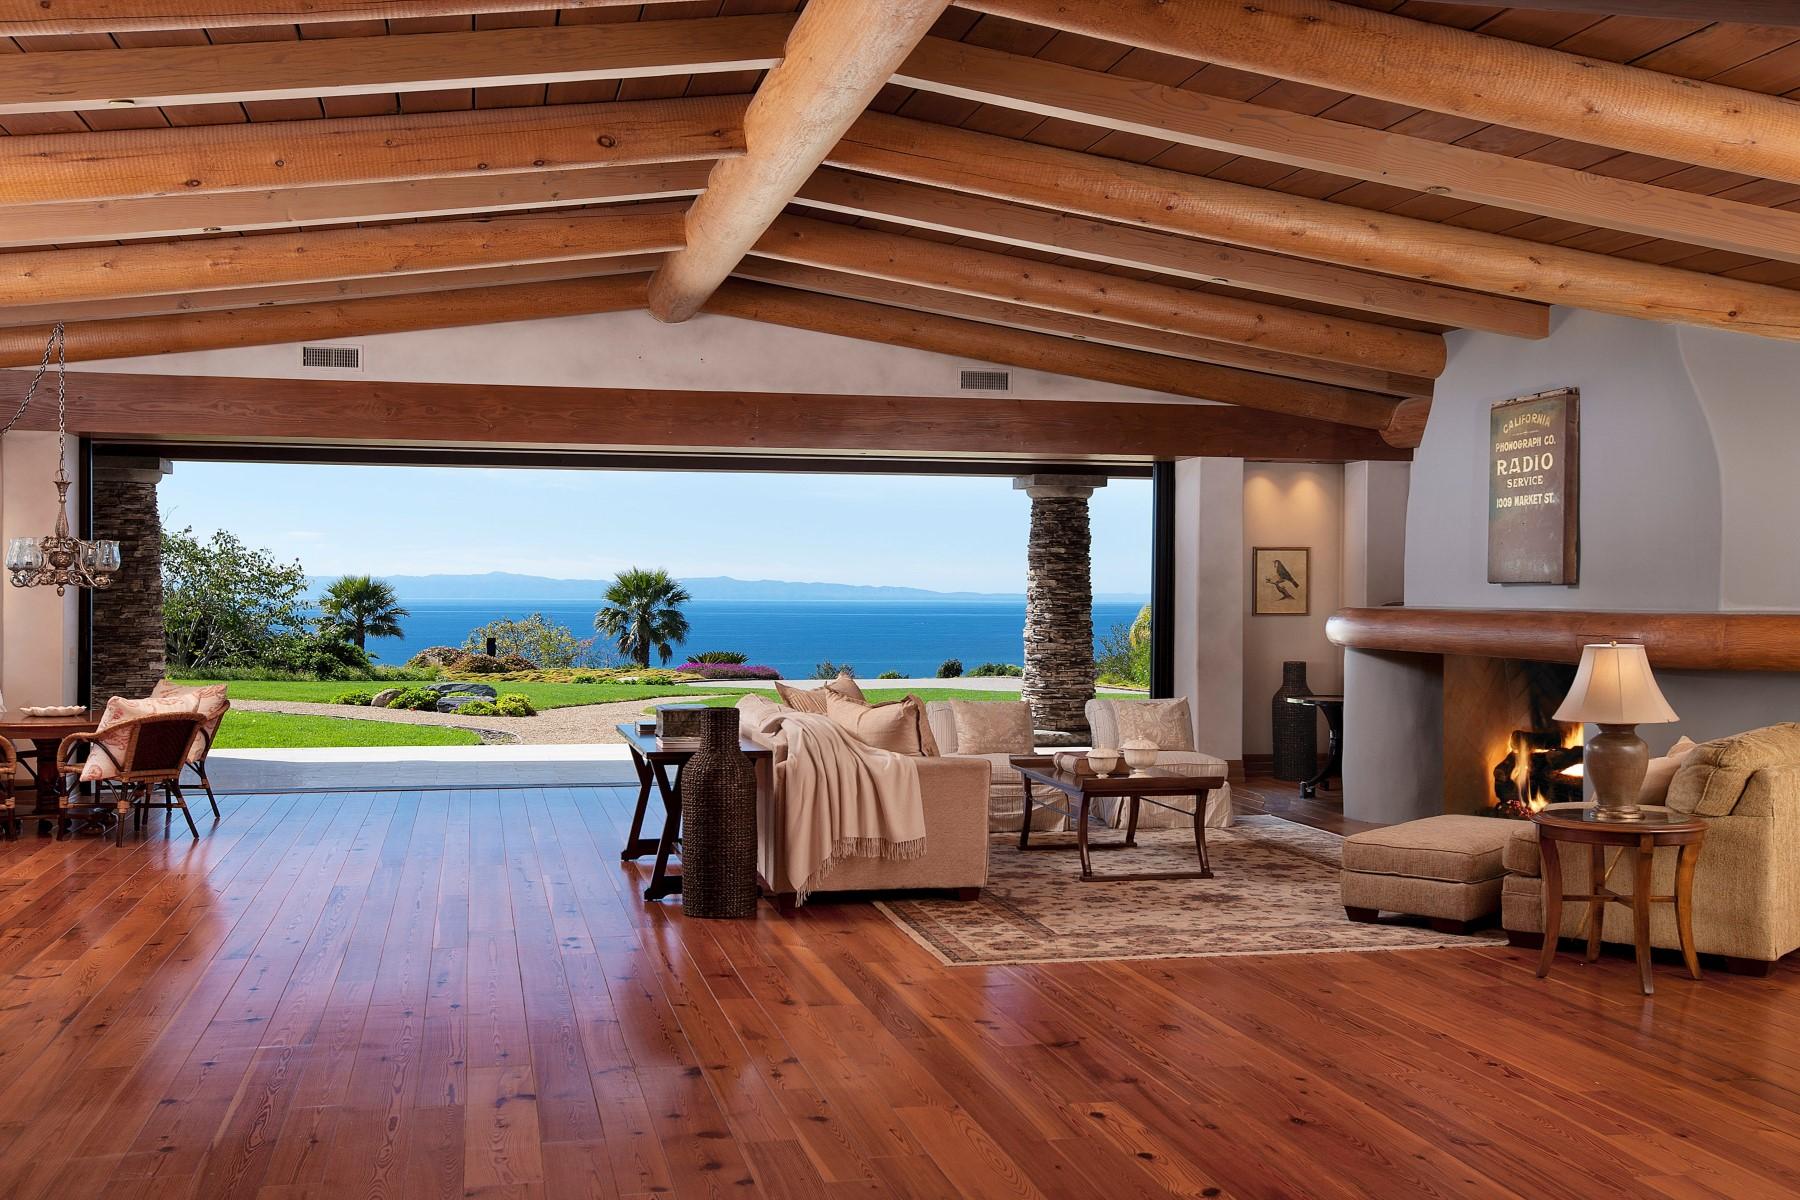 Single Family Home for Sale at Stunning Ocean and Mountain Views 2170 Ortega Ranch Lane Montecito - Upper Village, Santa Barbara, California 93108 United States